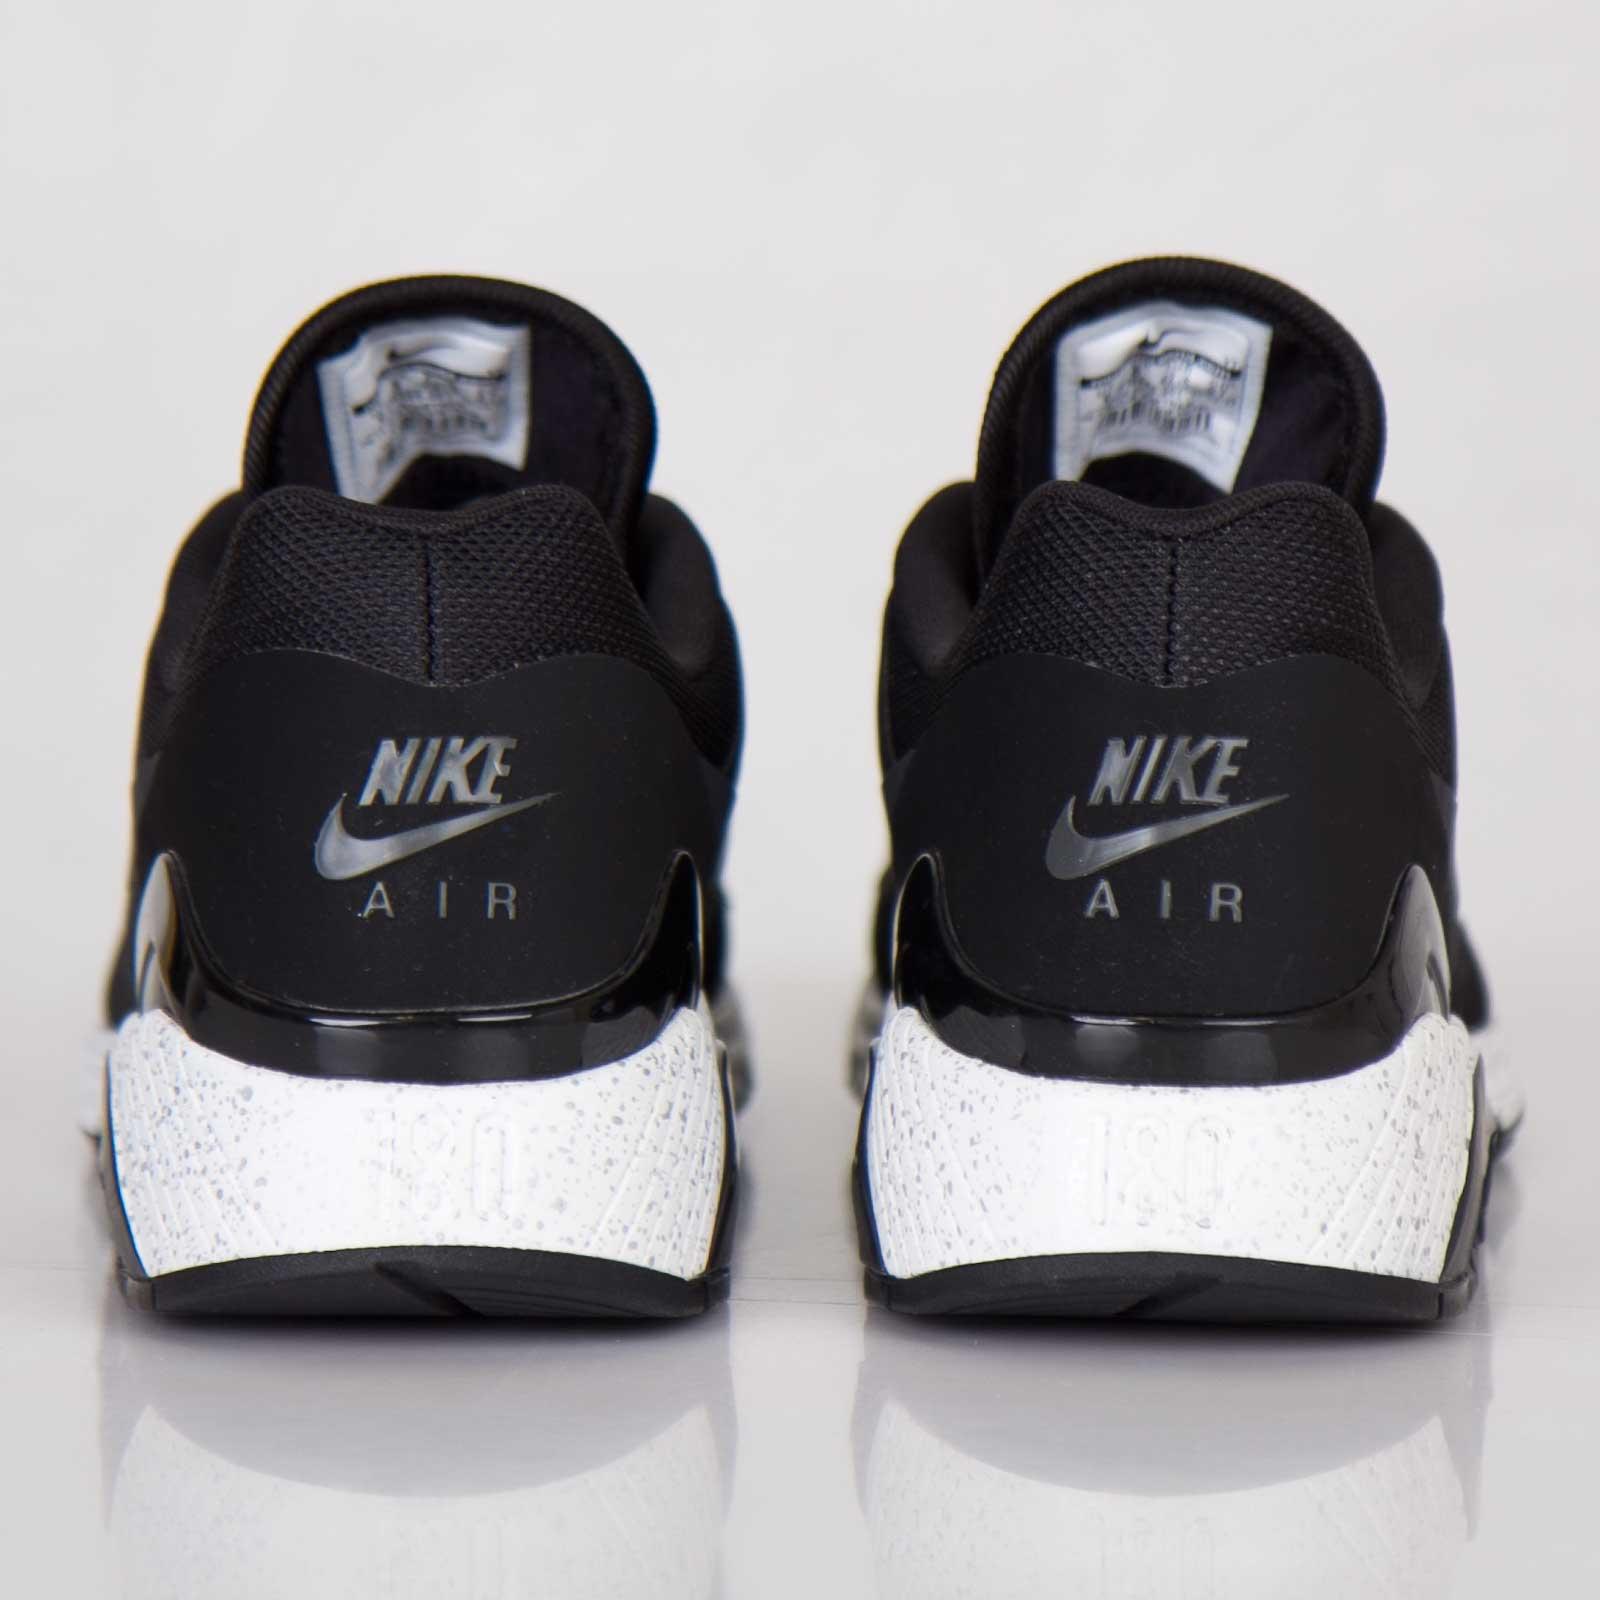 e750ad6f5792 Nike Air Terra 180 - 615589-001 - Sneakersnstuff